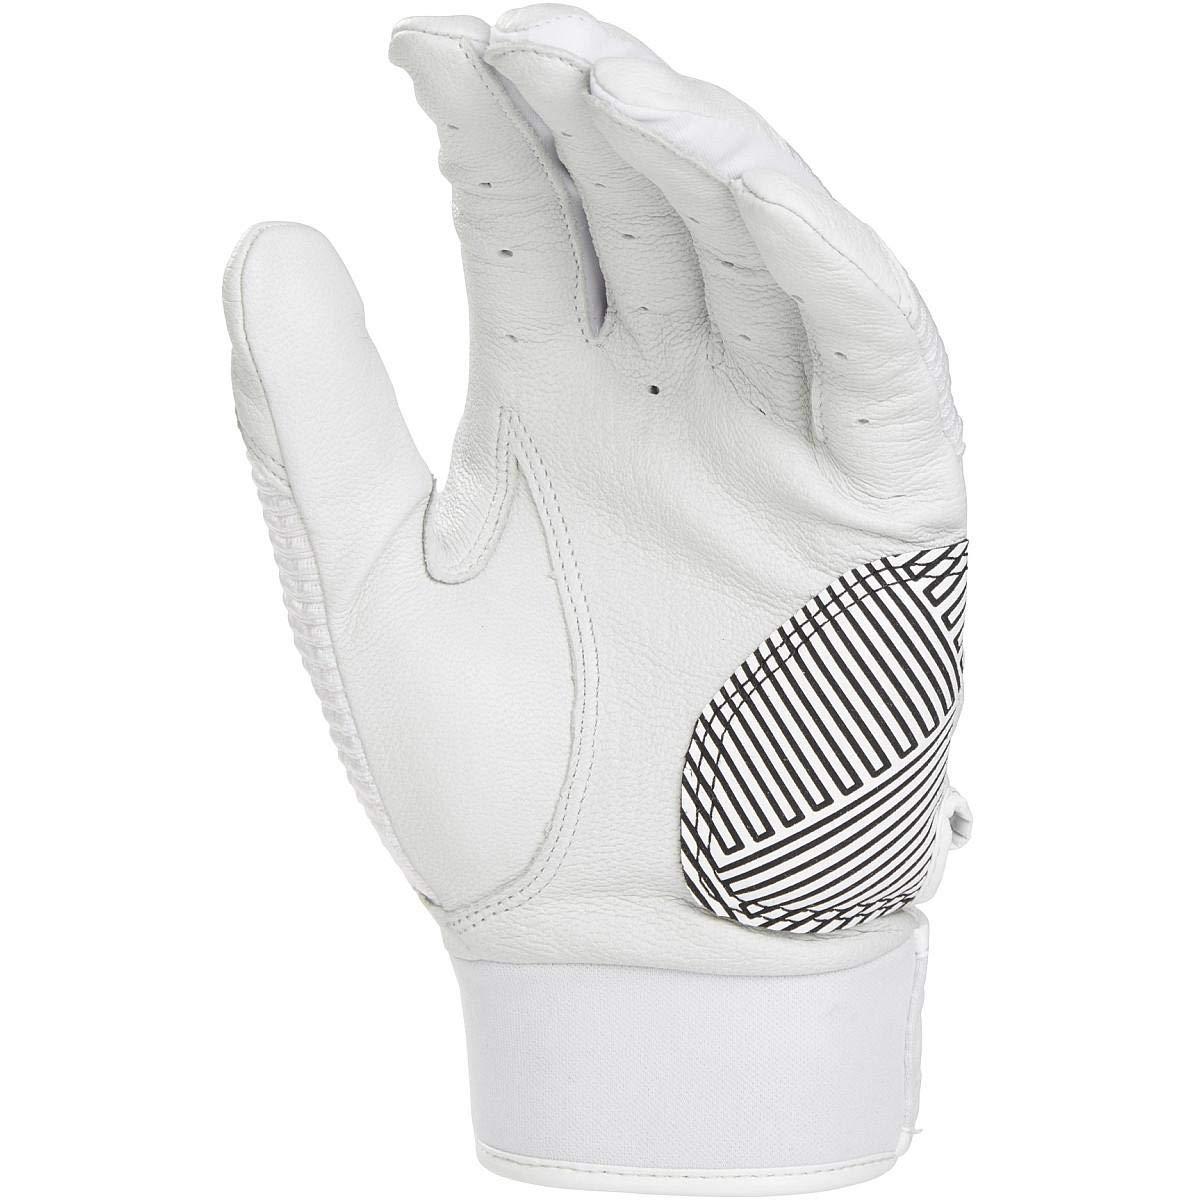 Rawlings Workhorse Adult Batting Gloves